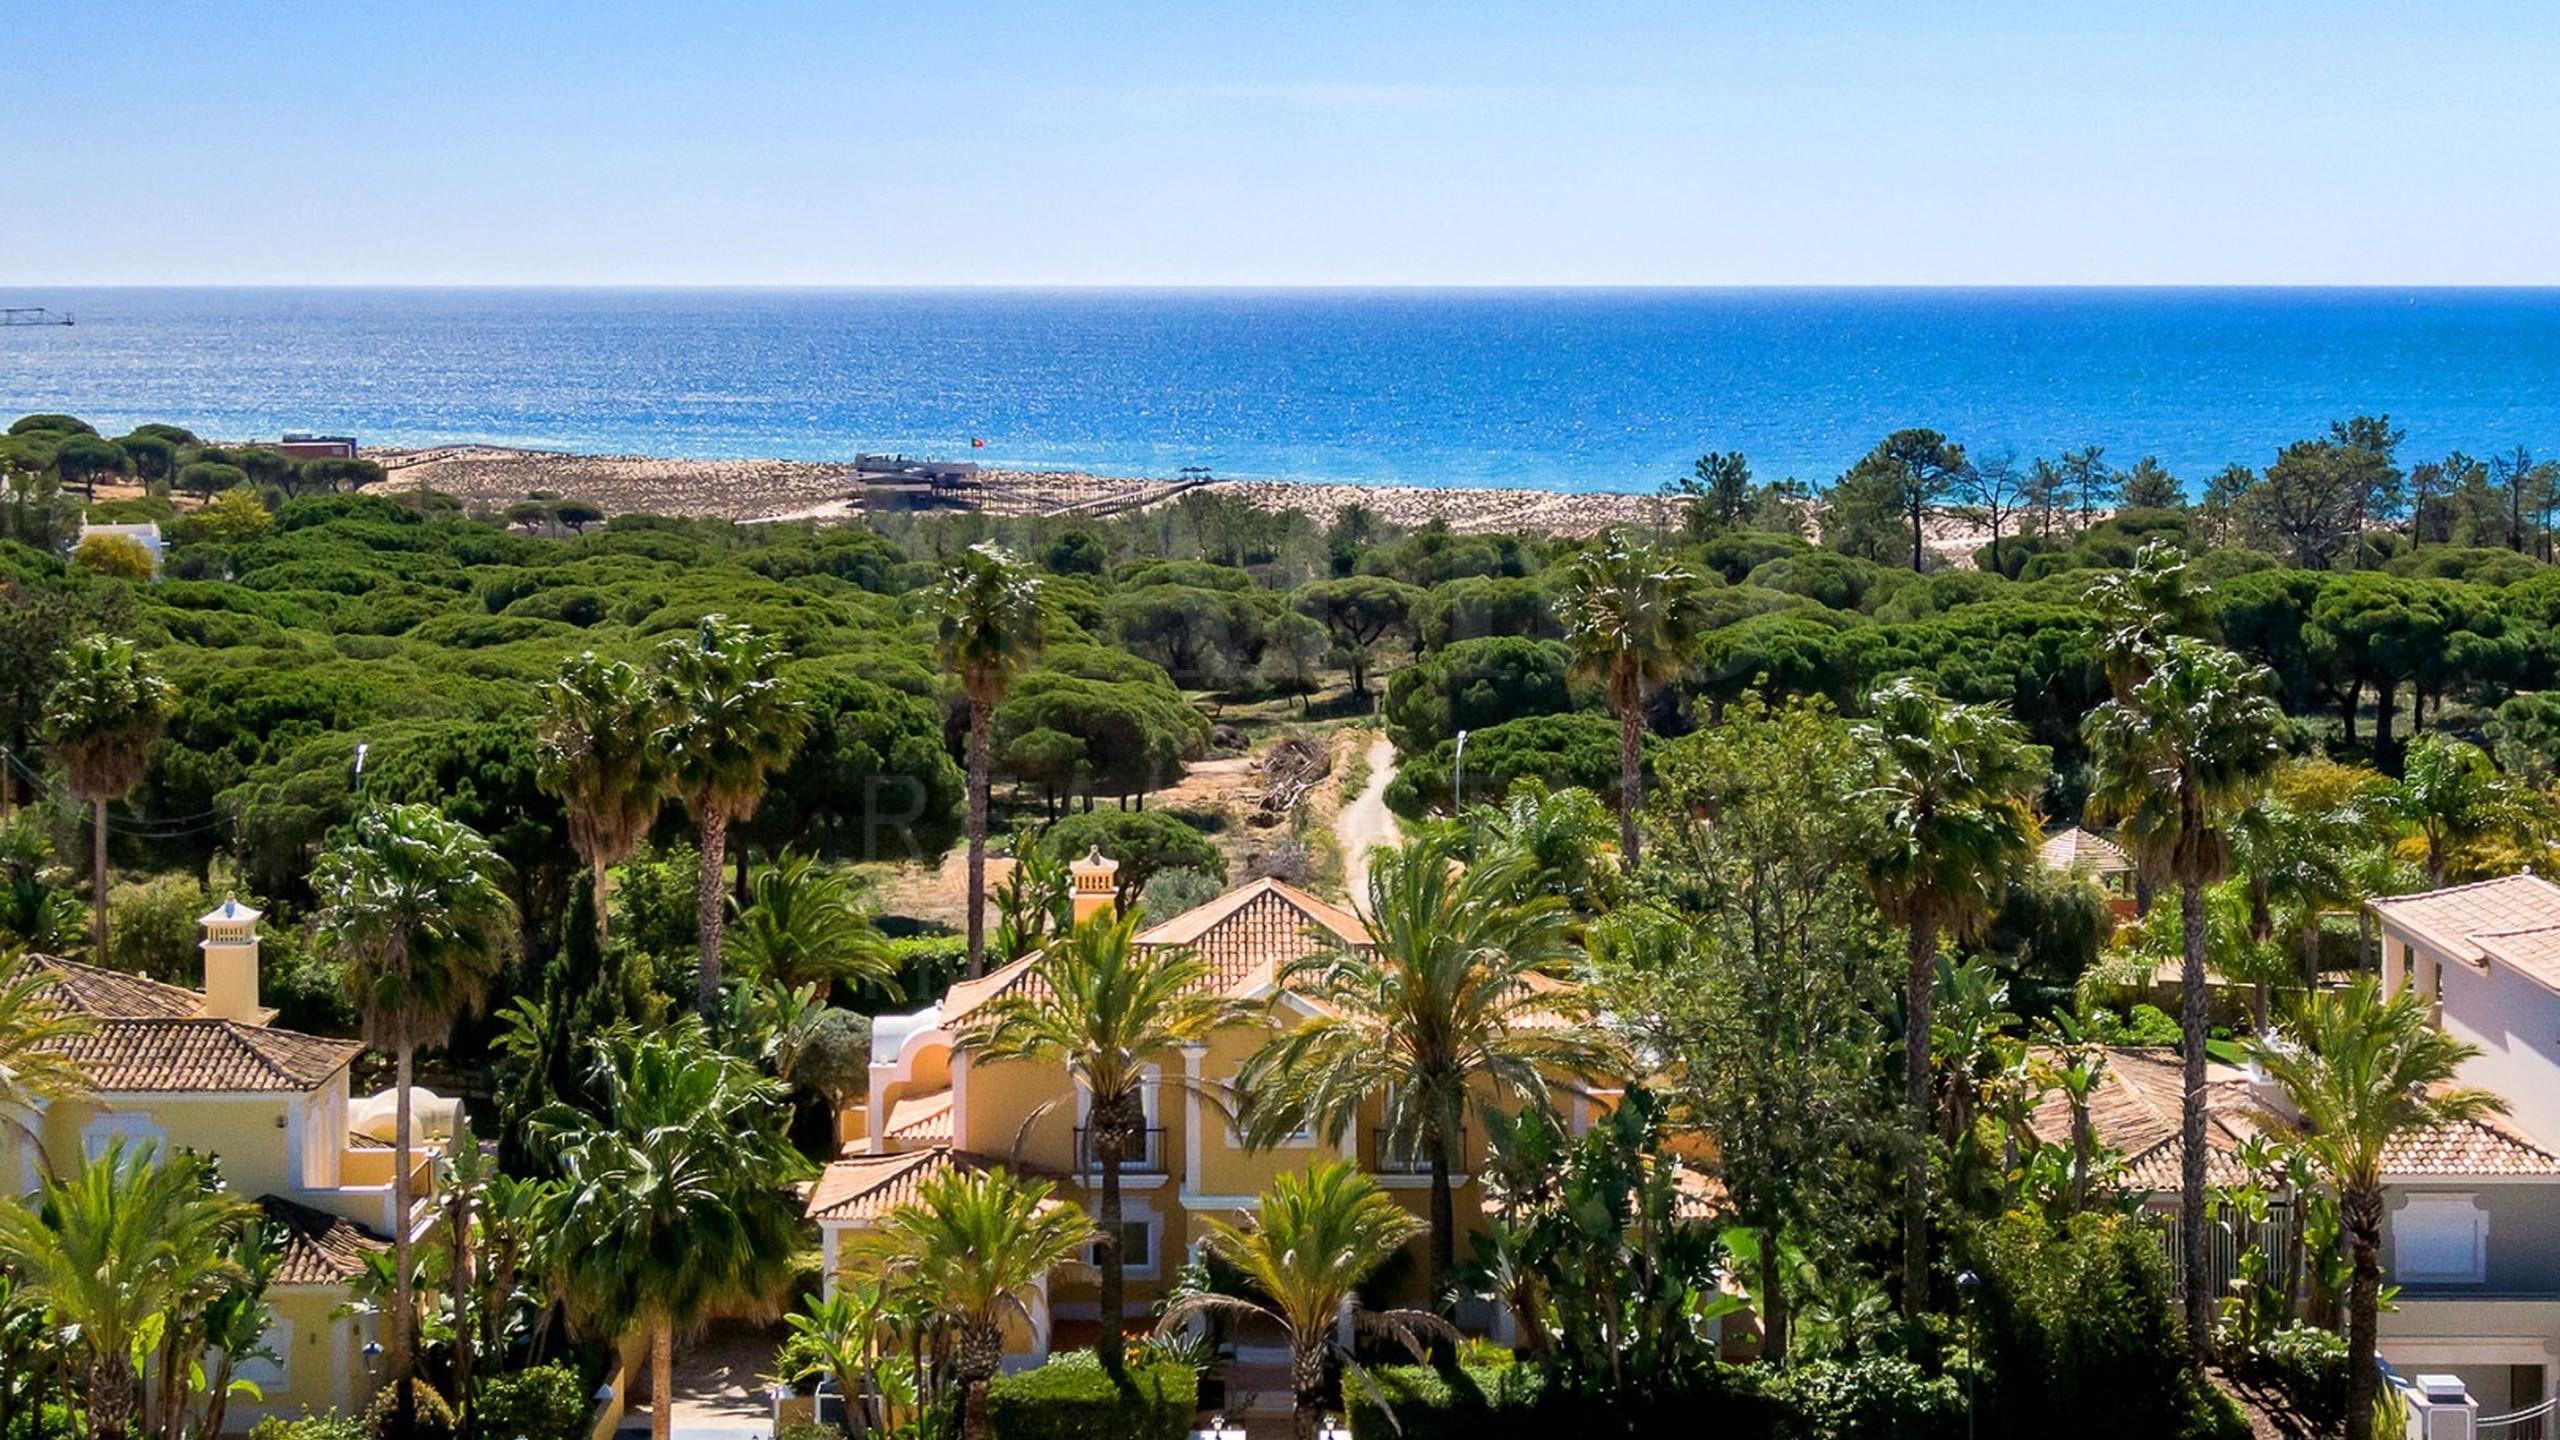 House for sale in Algarve near the sea